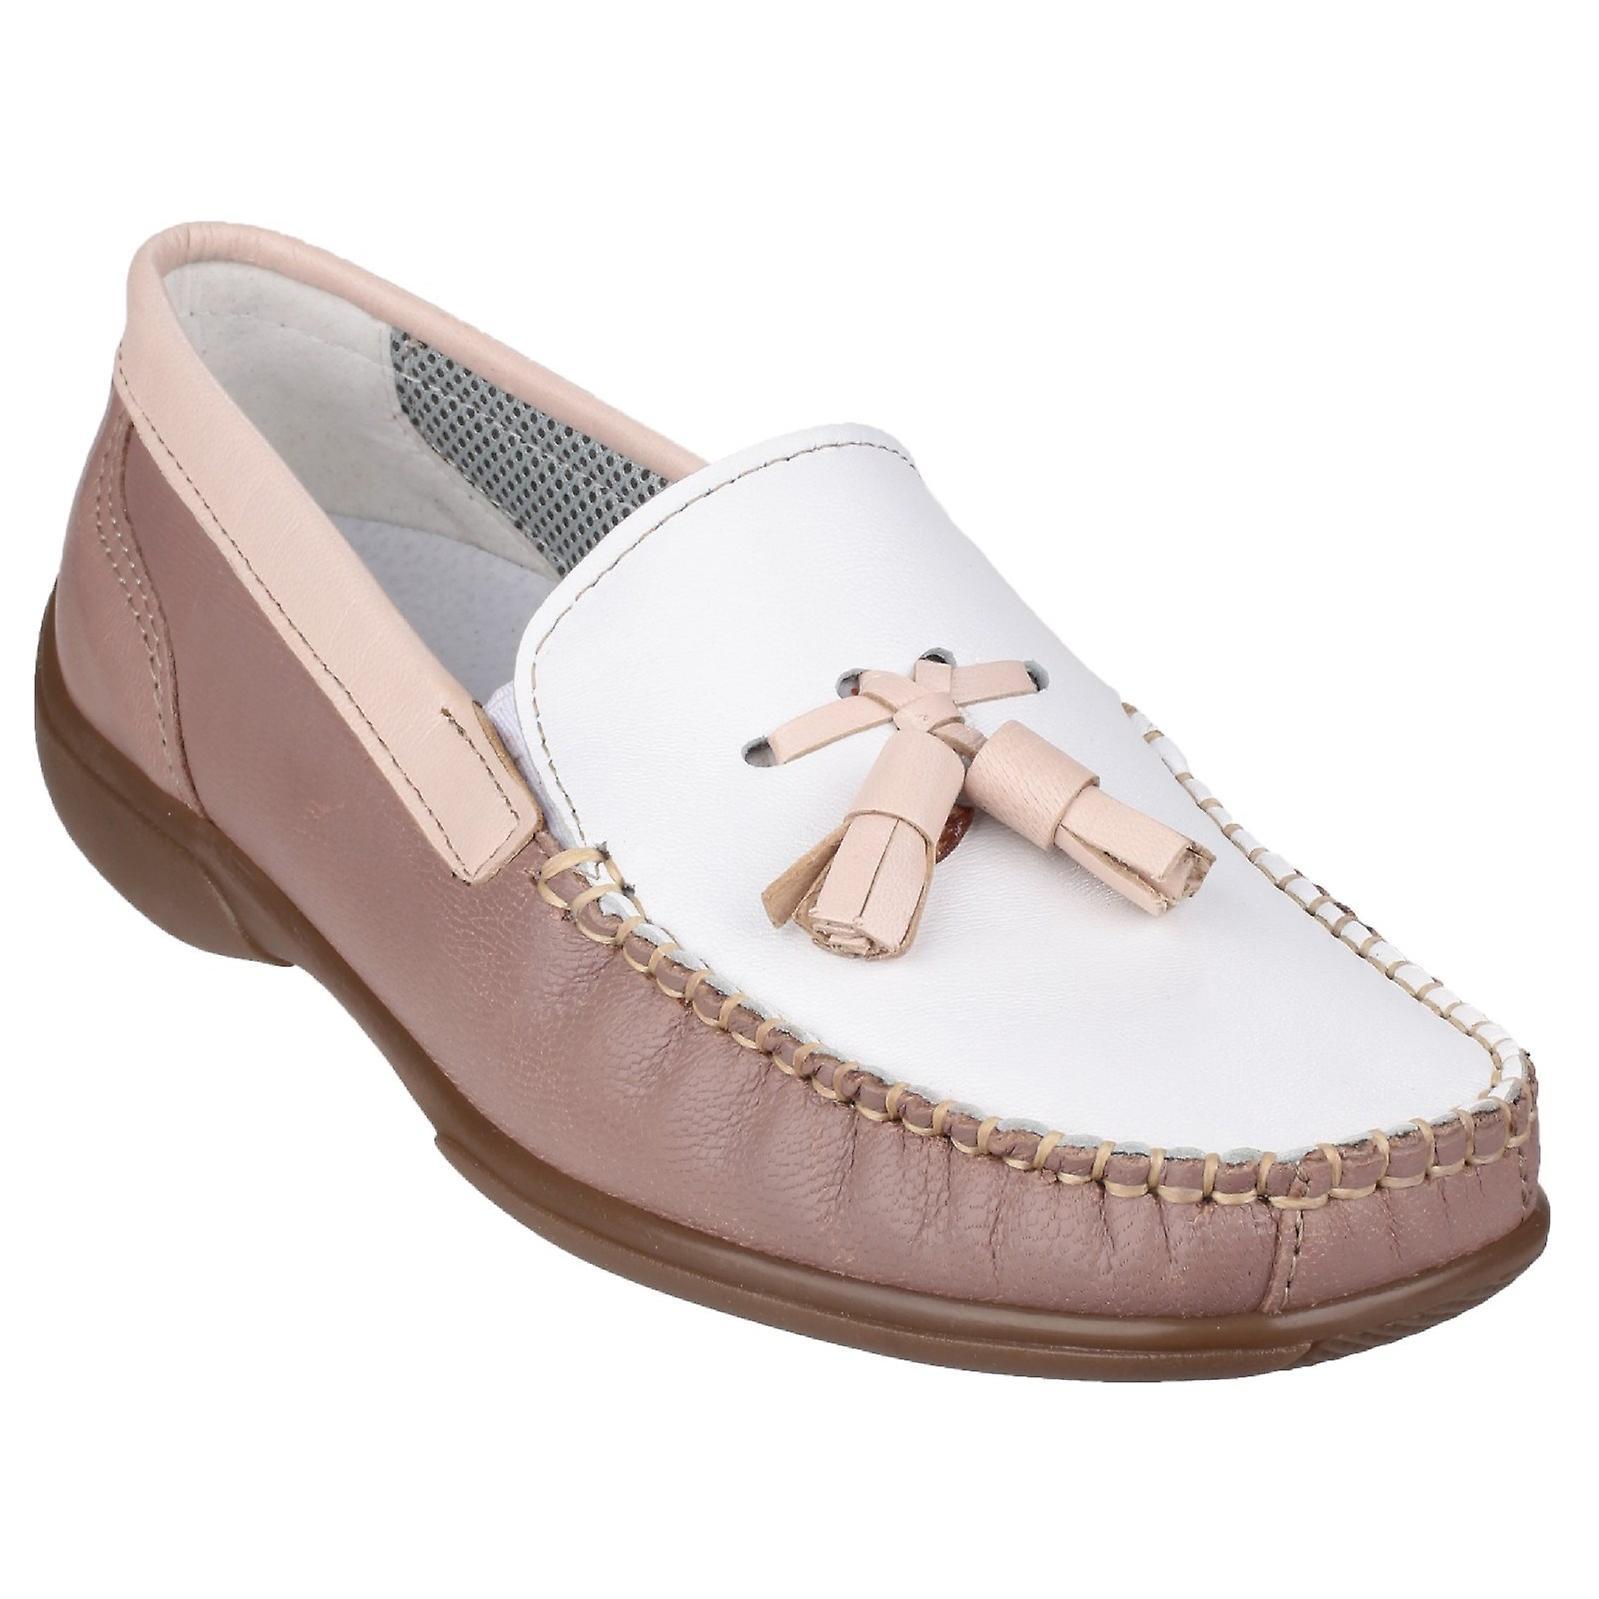 Cotswold Biddlestone Slip On Loafer Shoe